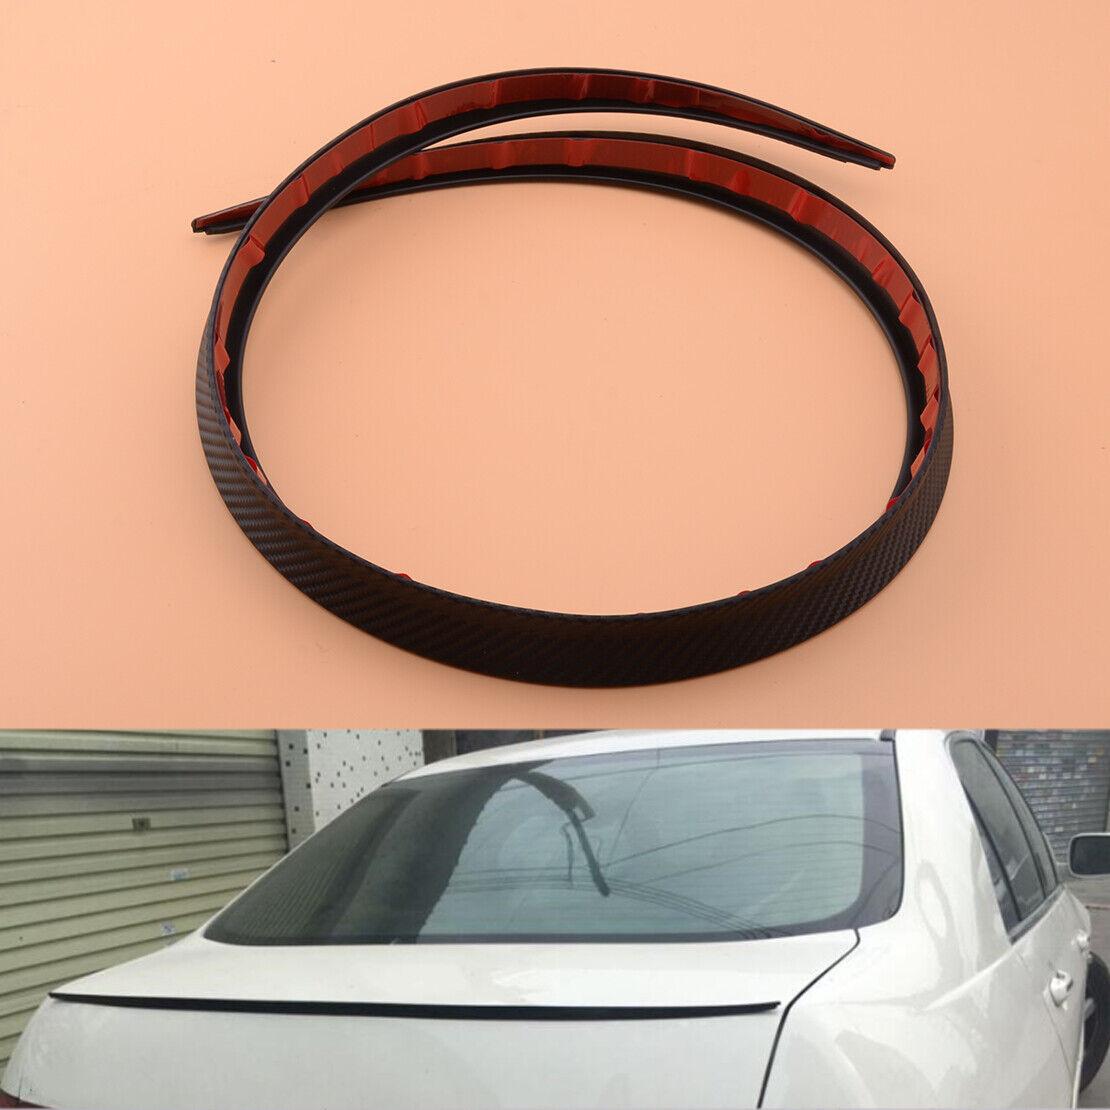 Carbon Fiber Surface Car SUV Rear Spoiler Wing Lip Trim Protector Cover Black